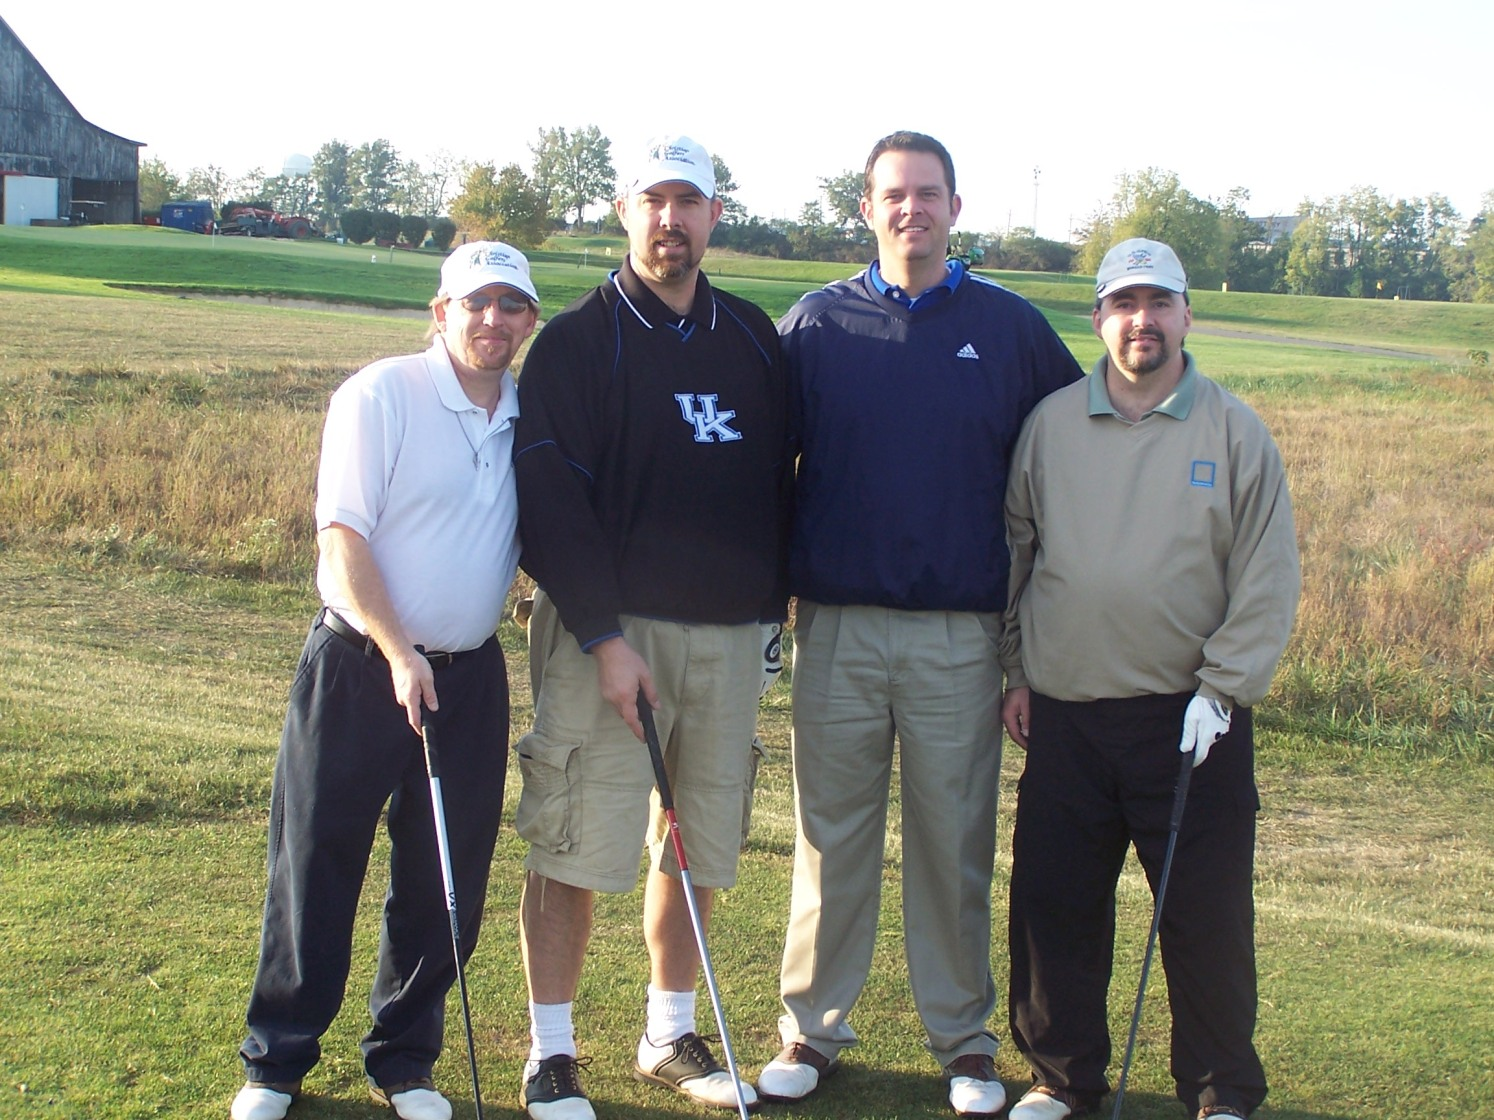 George Sandlin, Me, Todd Stinson, BrianTimberlake